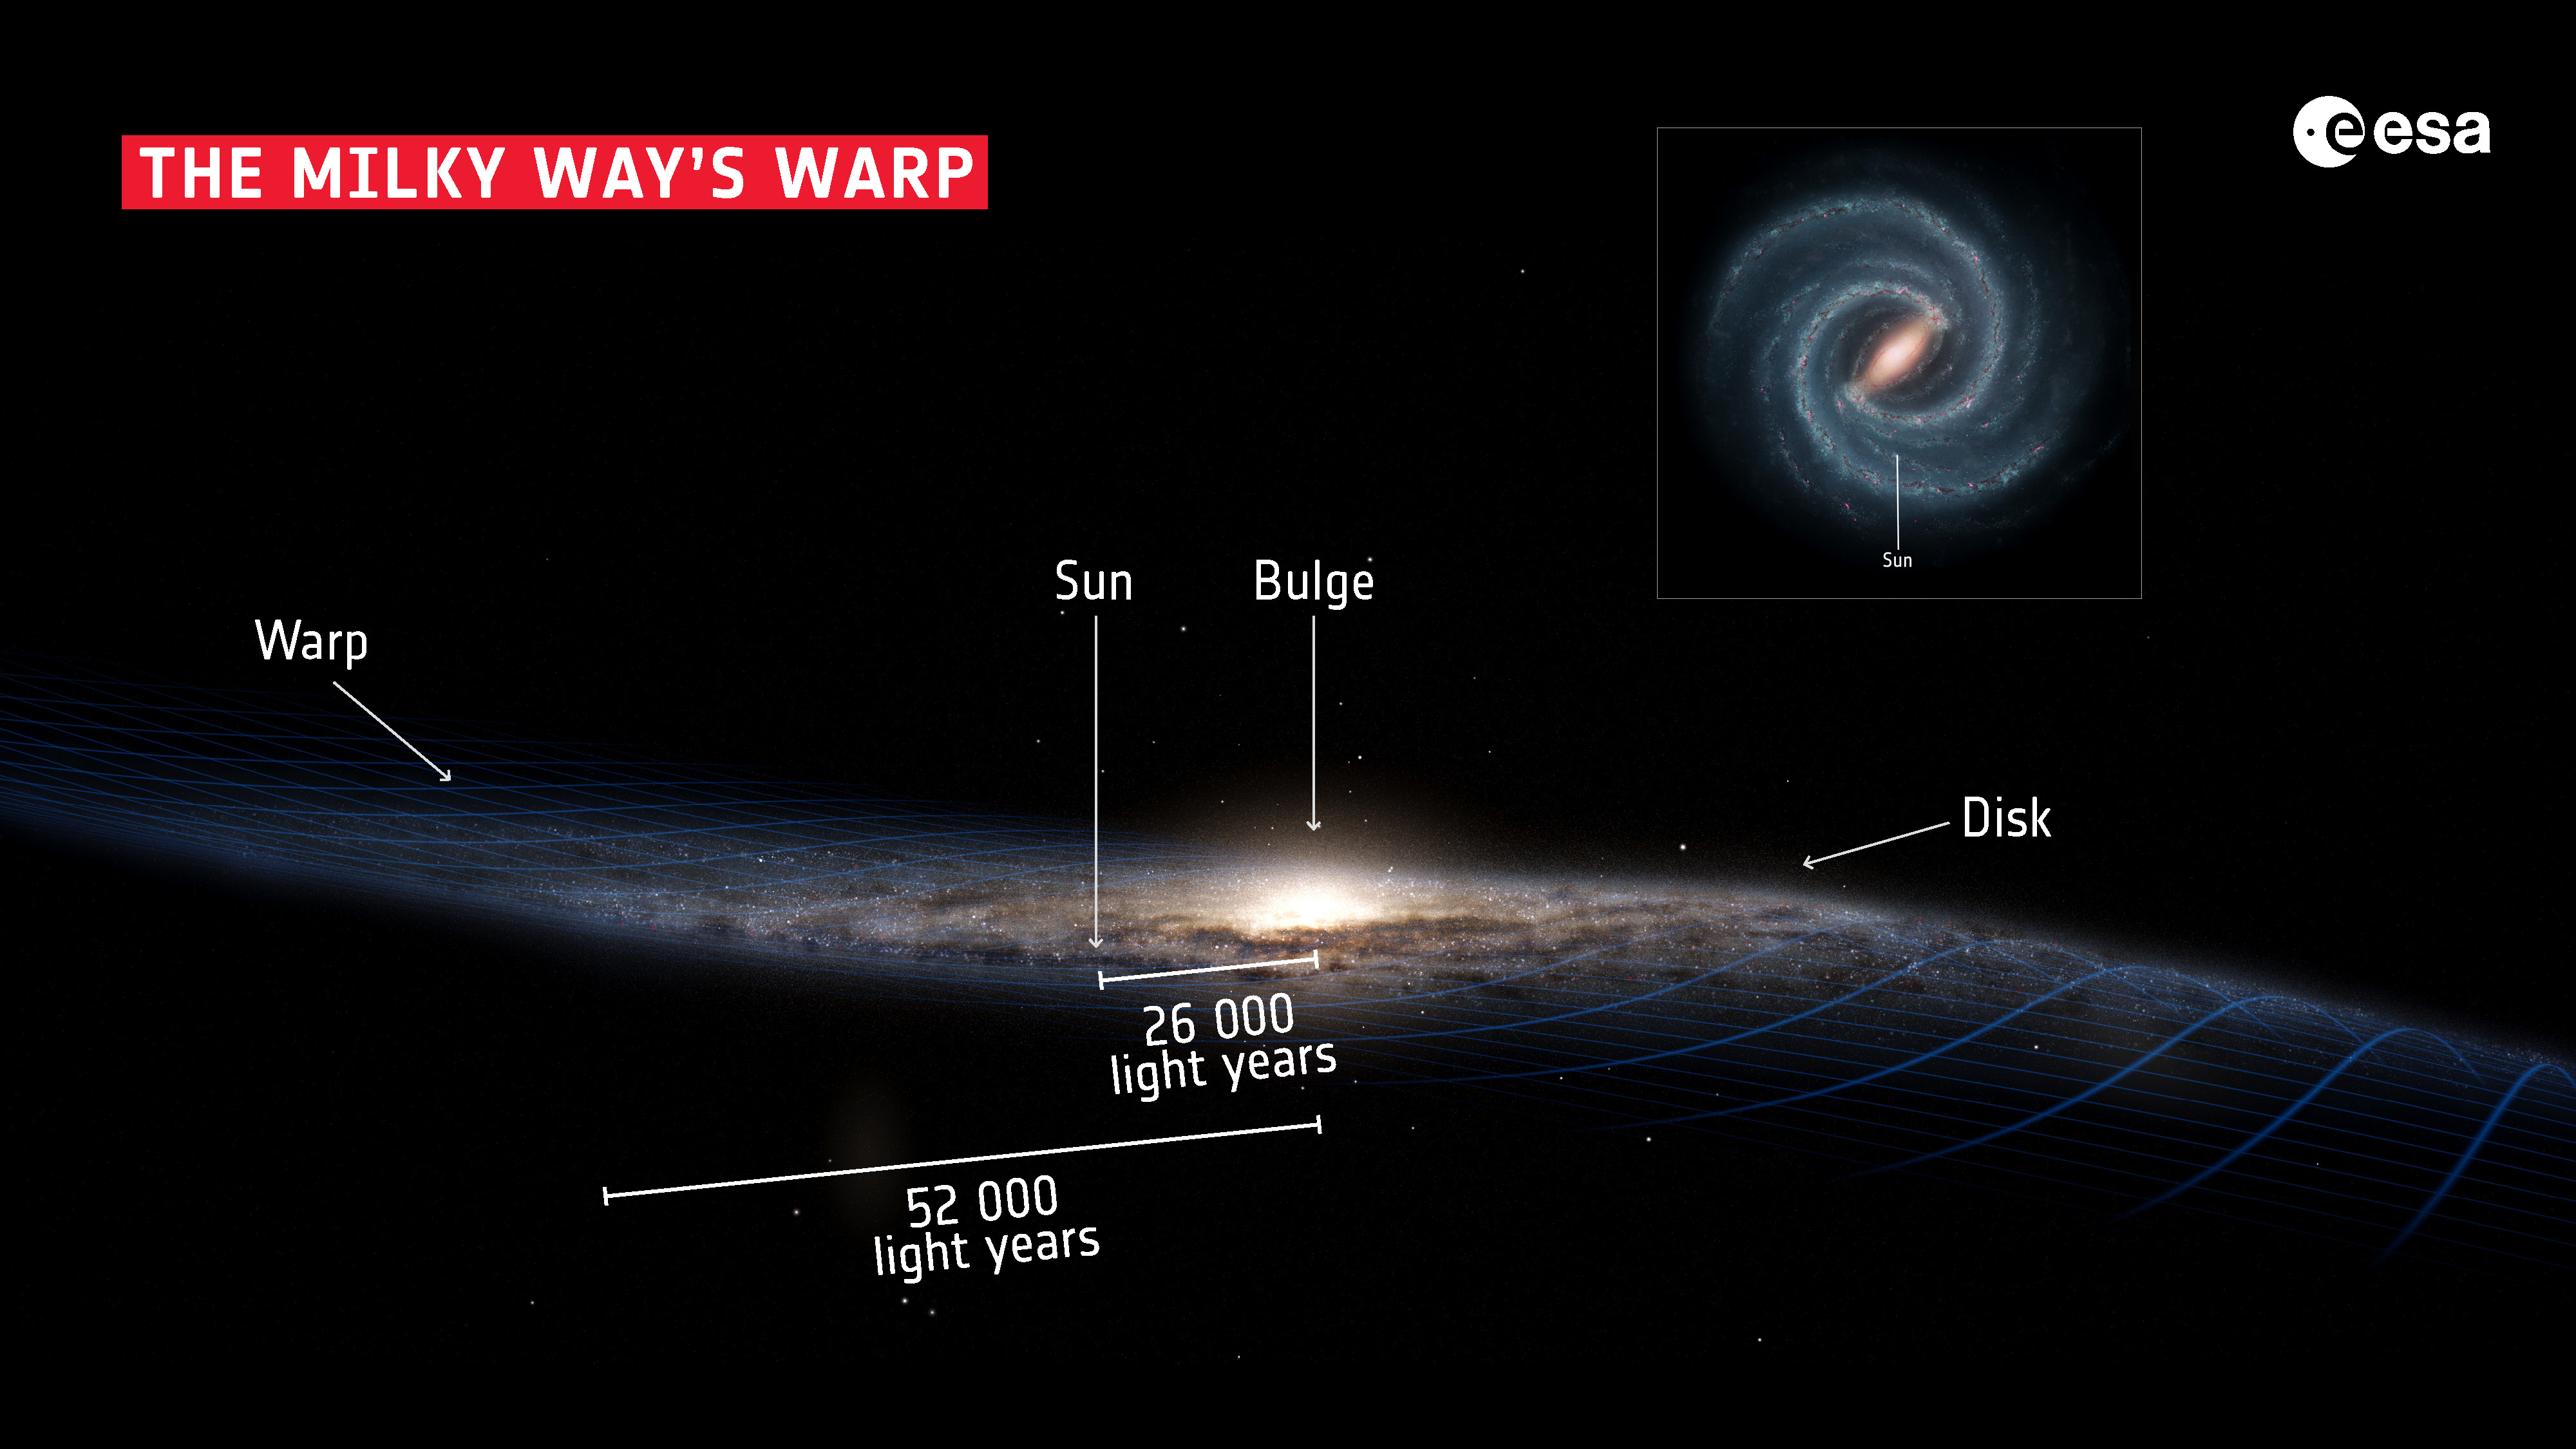 Galaktisk kollision fick Vintergatan att wobbla